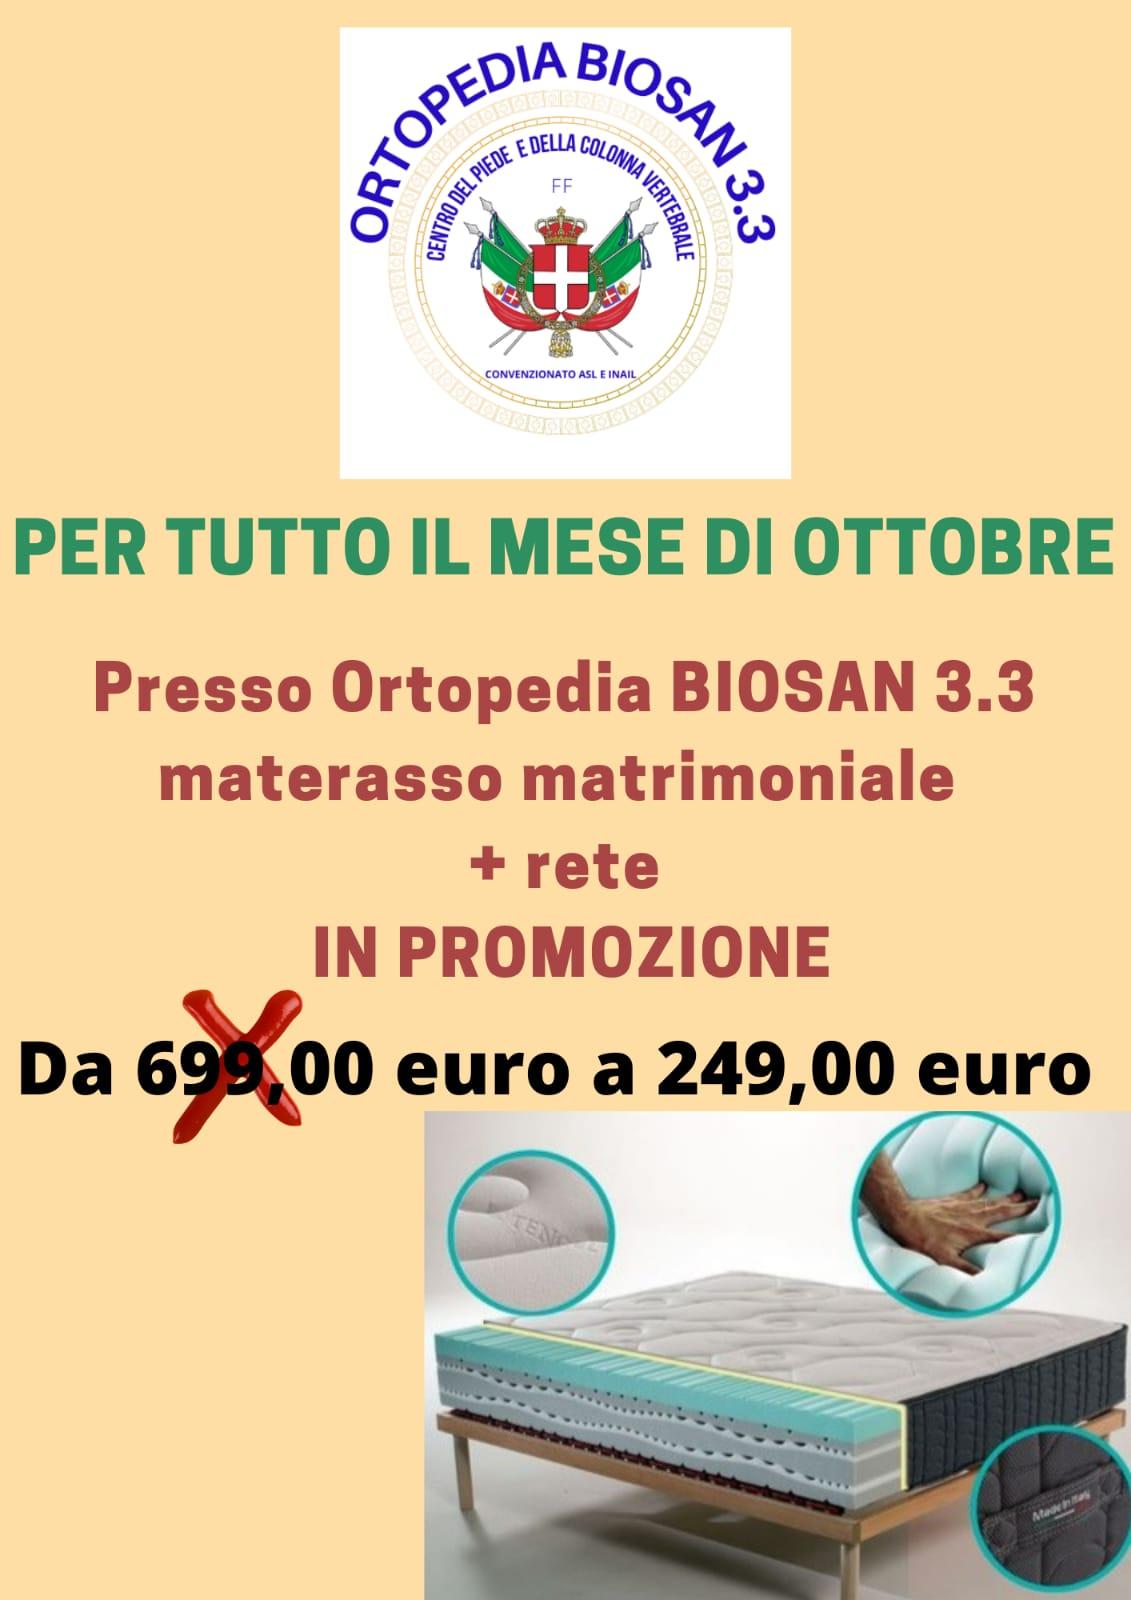 Ortopedia Biosan